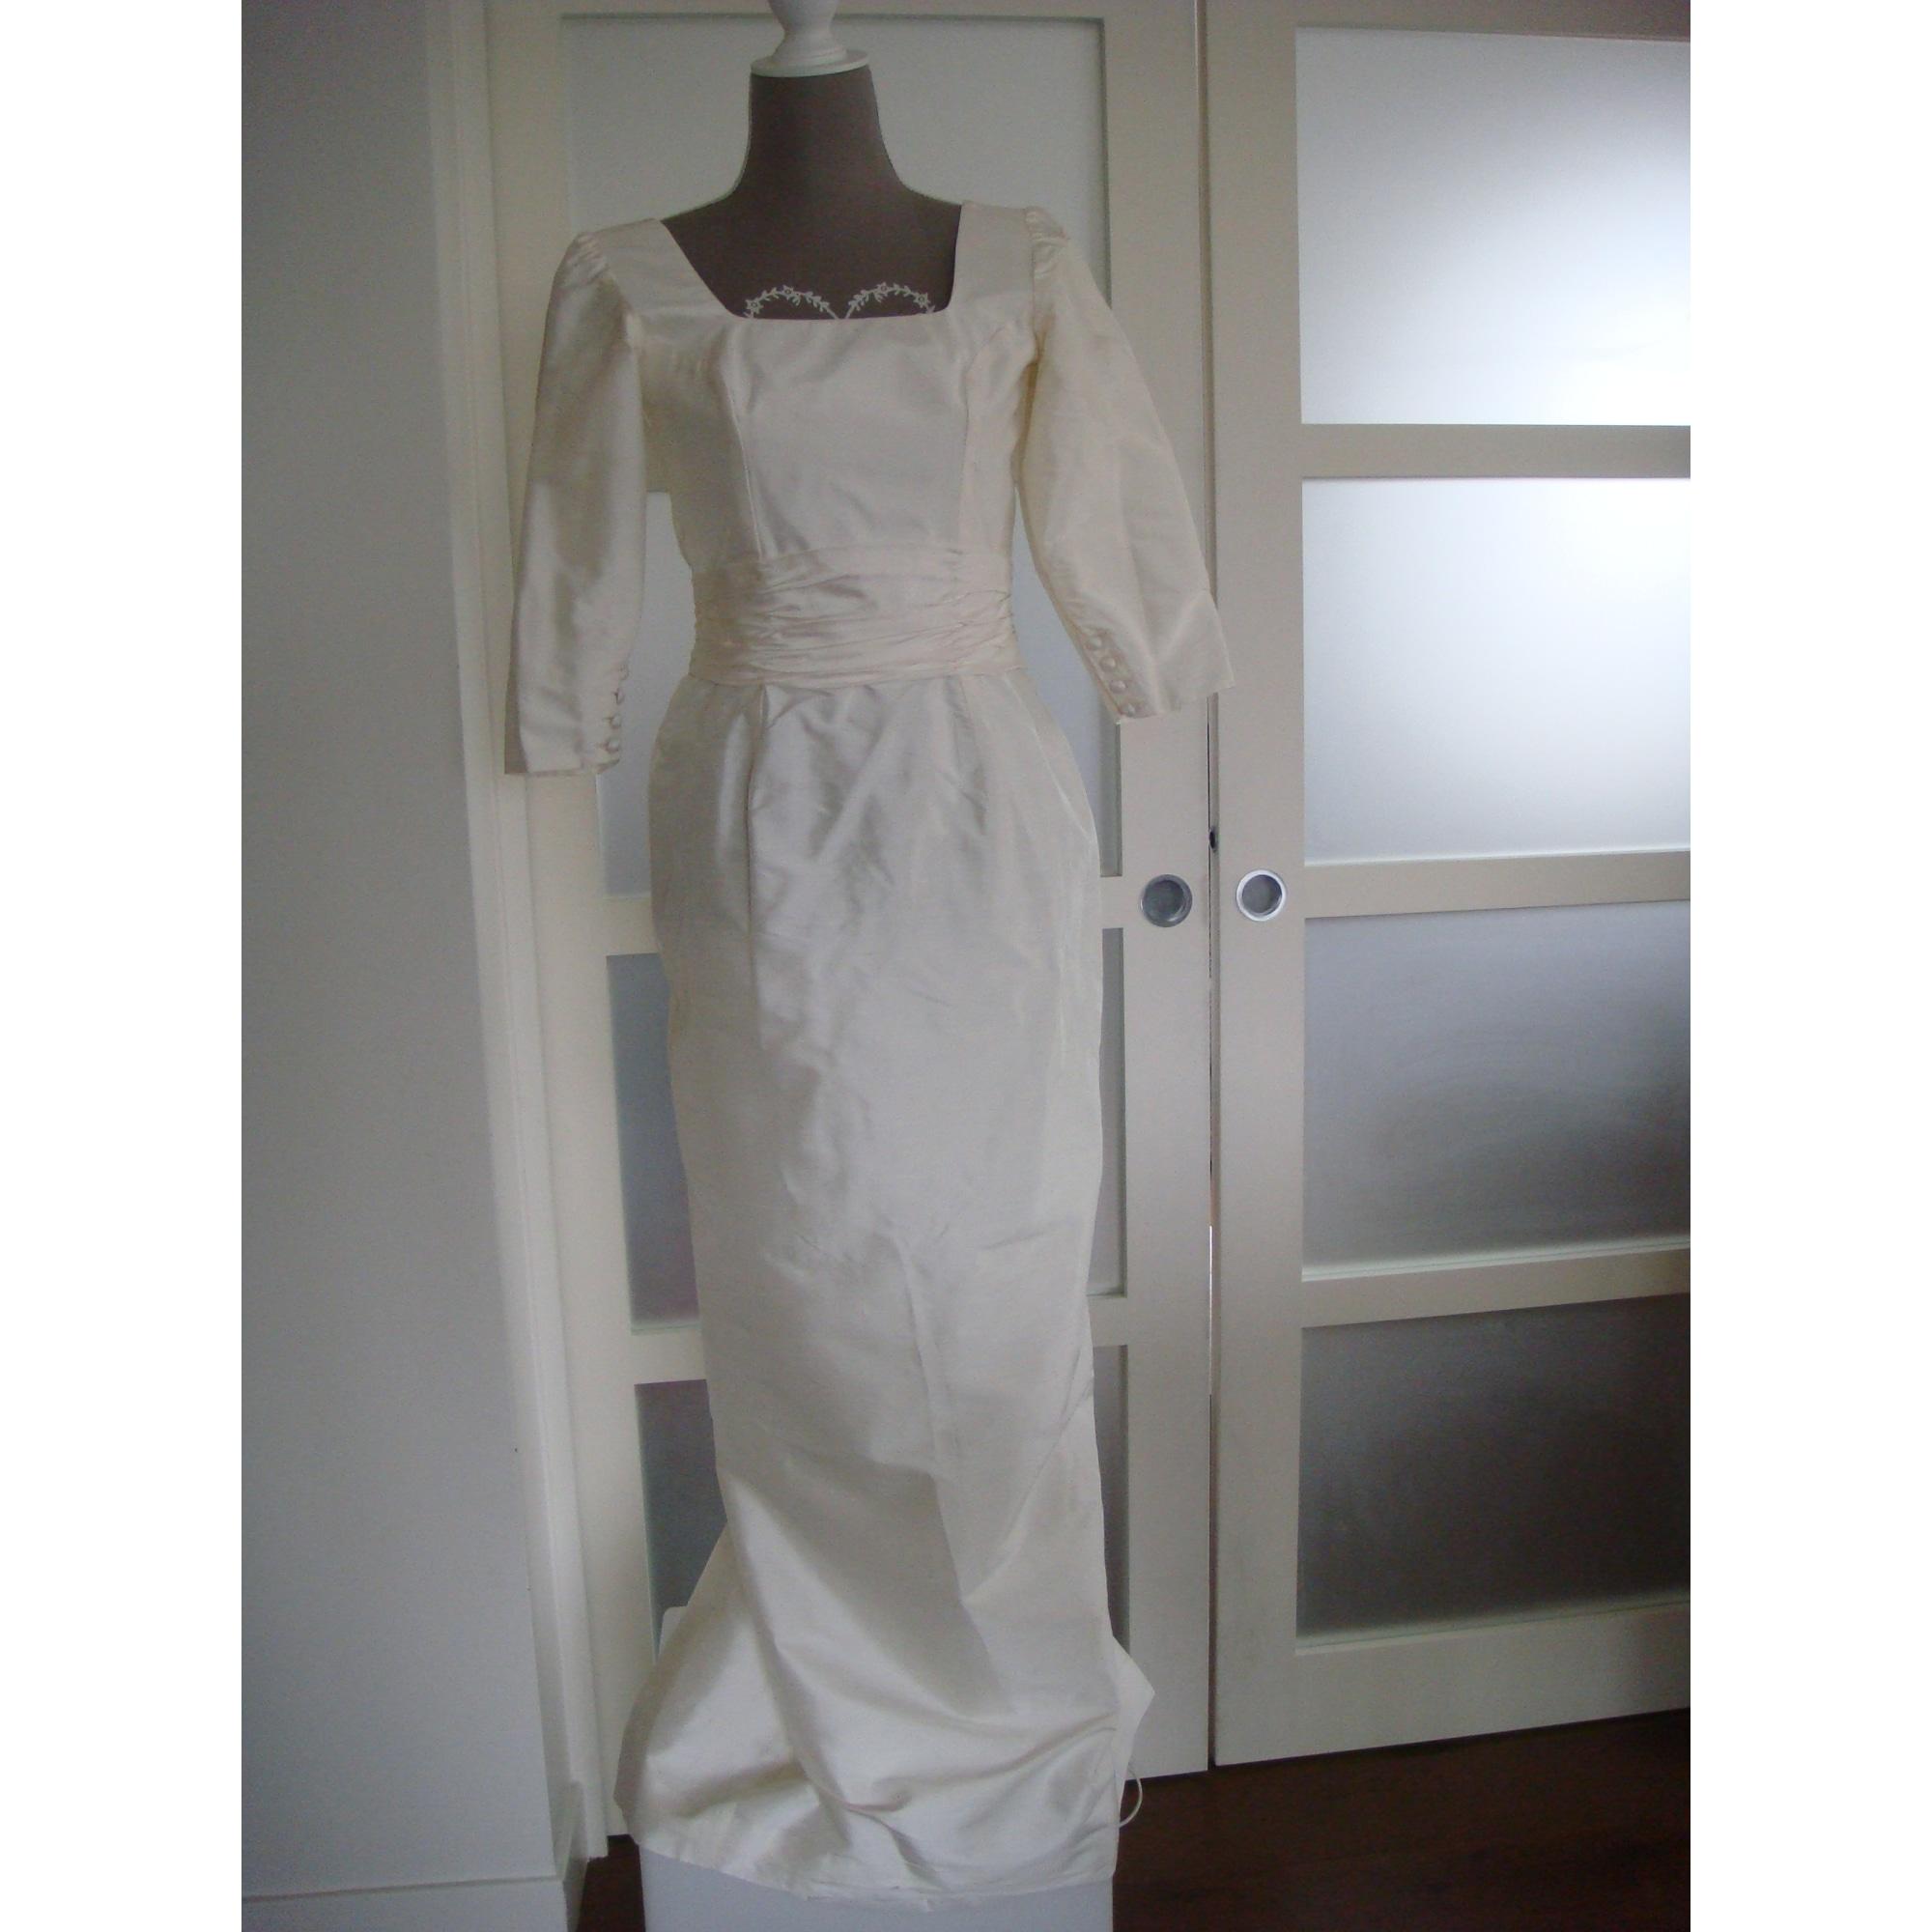 Prix robe mariee catherine varnier